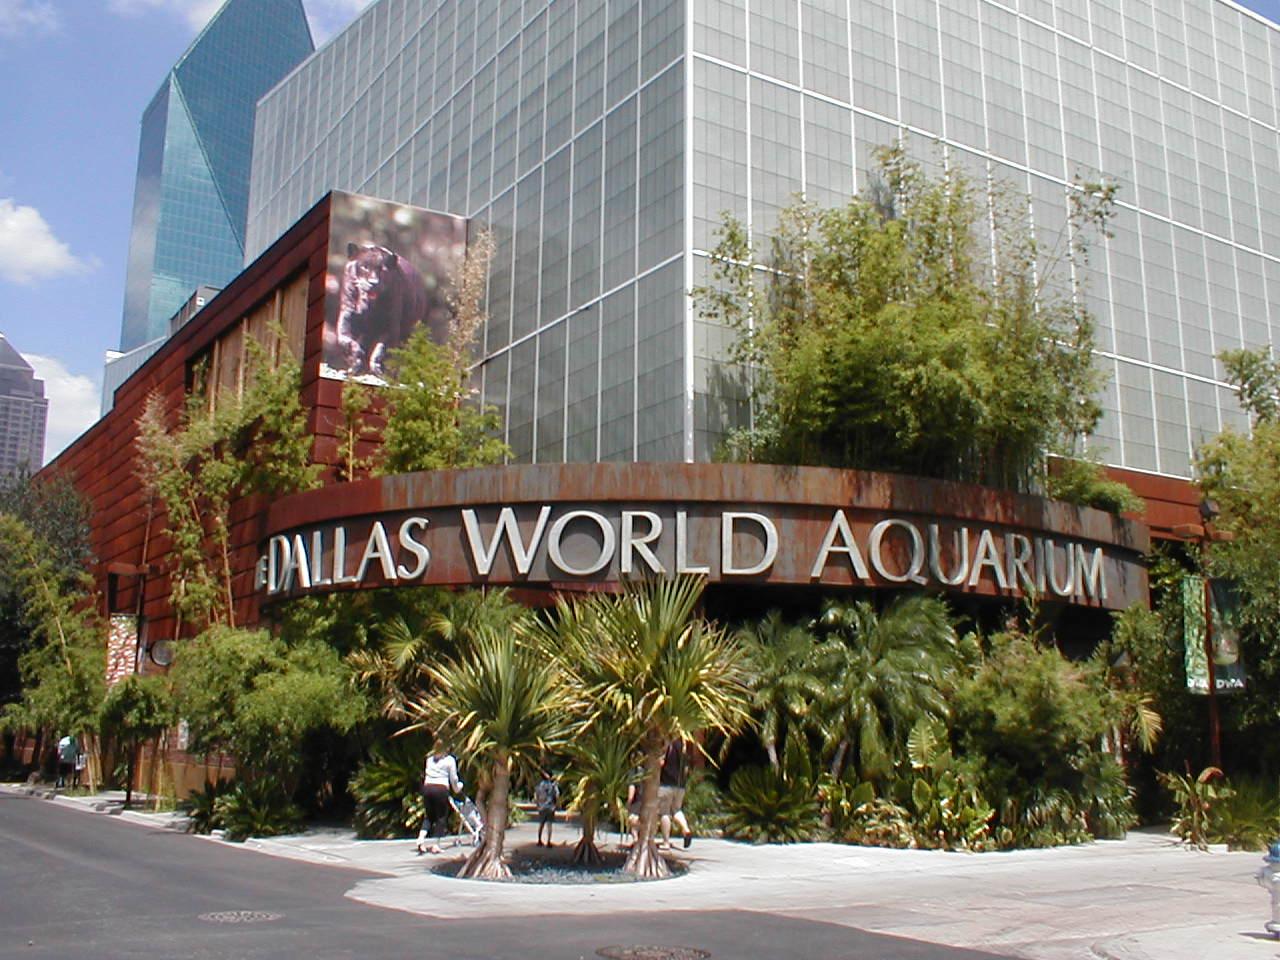 Dallas World Aquarium - Amazing Place To Explore In Dallas